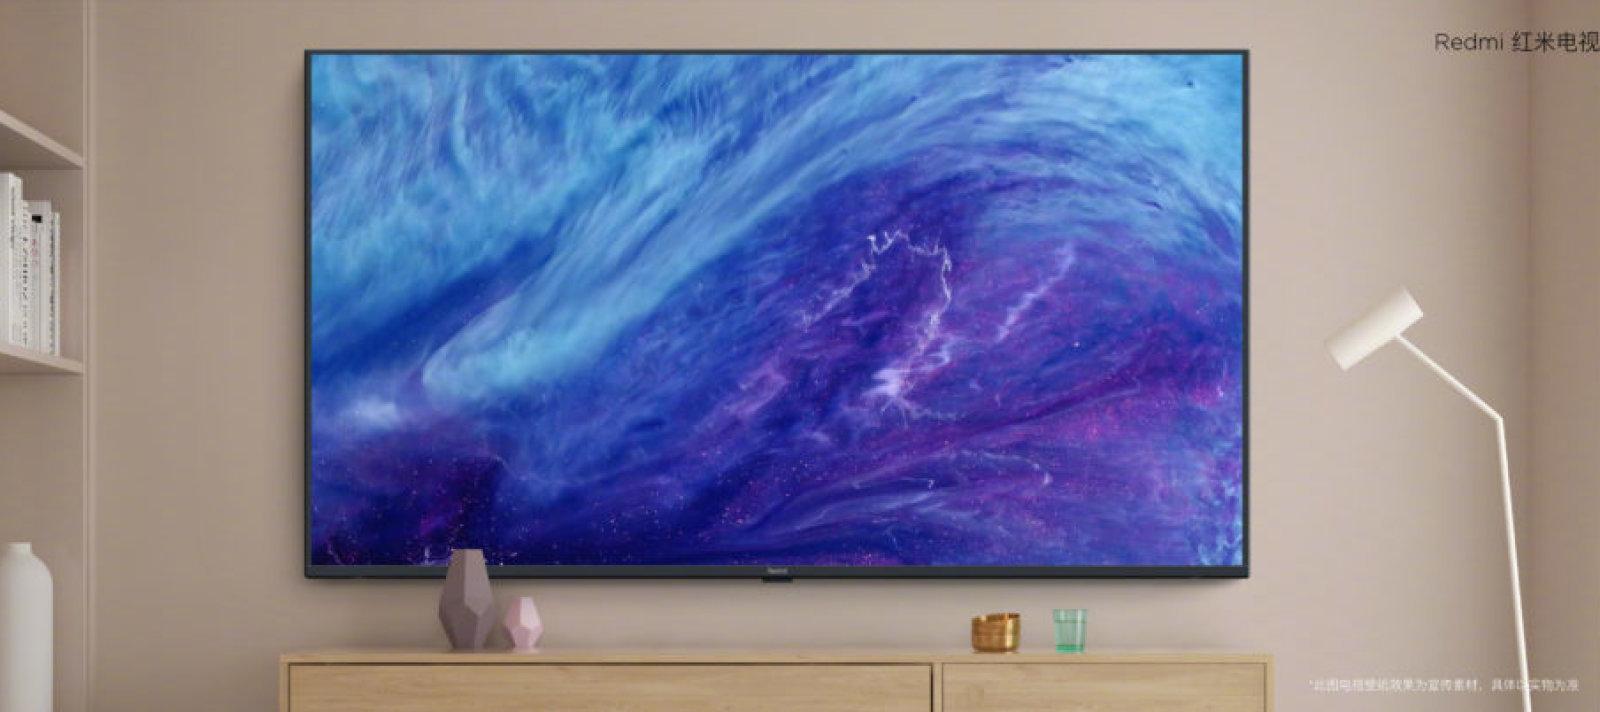 redmi tv 70 inch